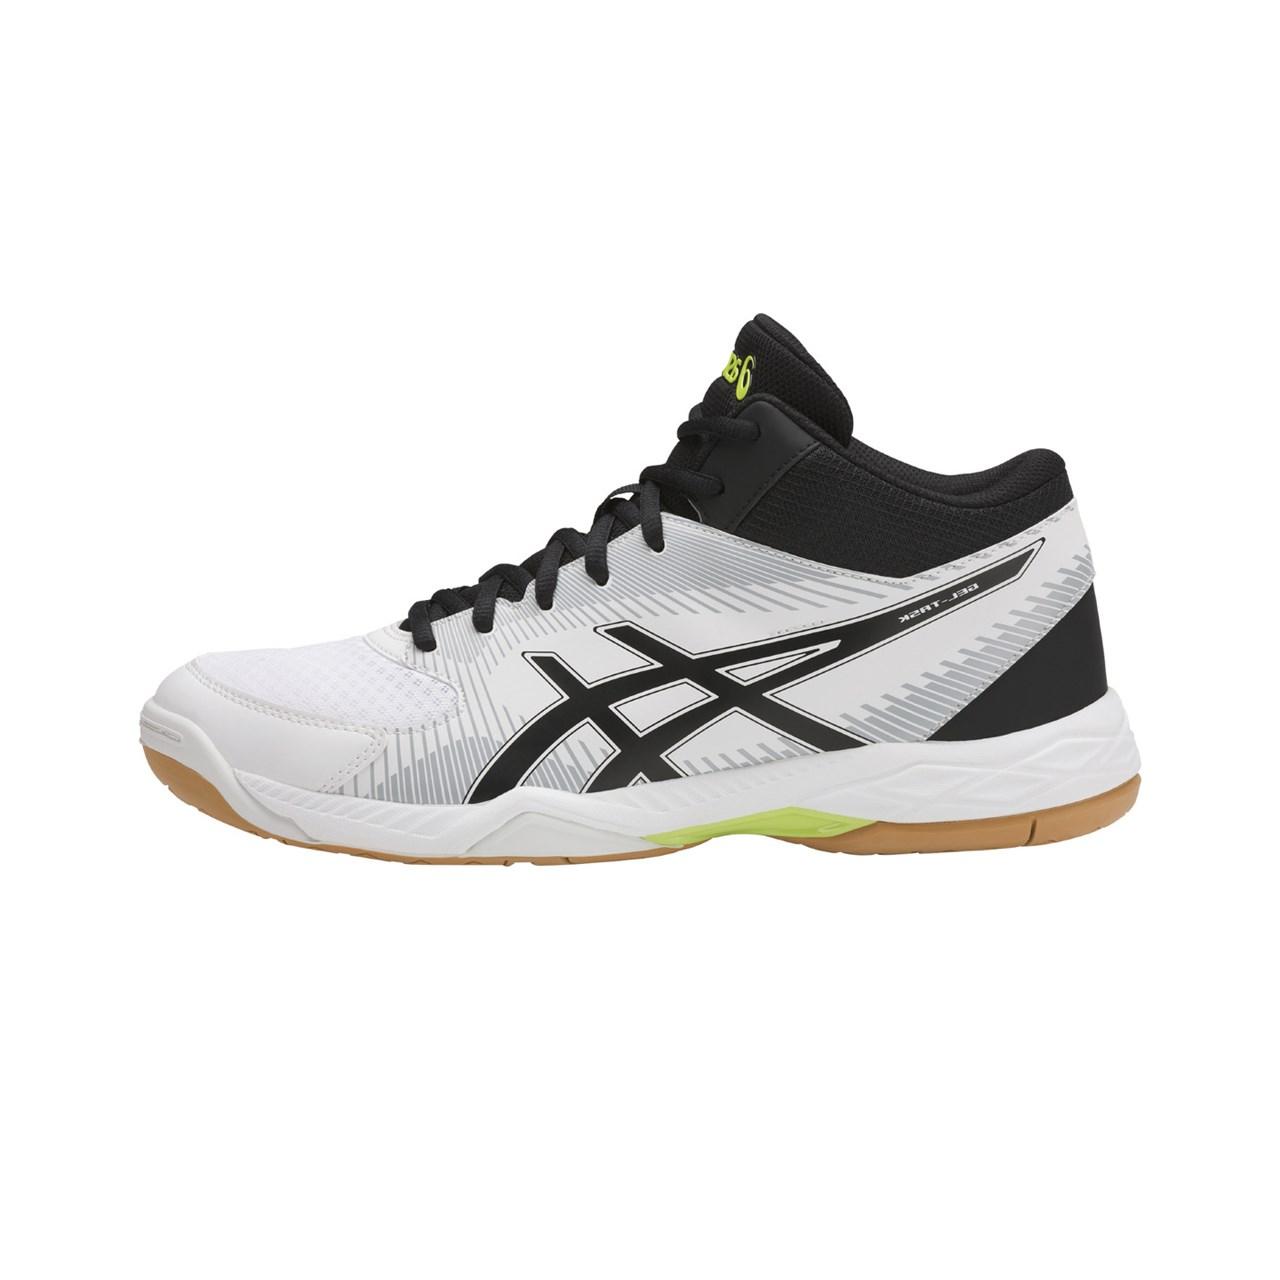 عکس کفش والیبال مردانه اسیکس مدل GEL-TASK MT کد B703Y-0190